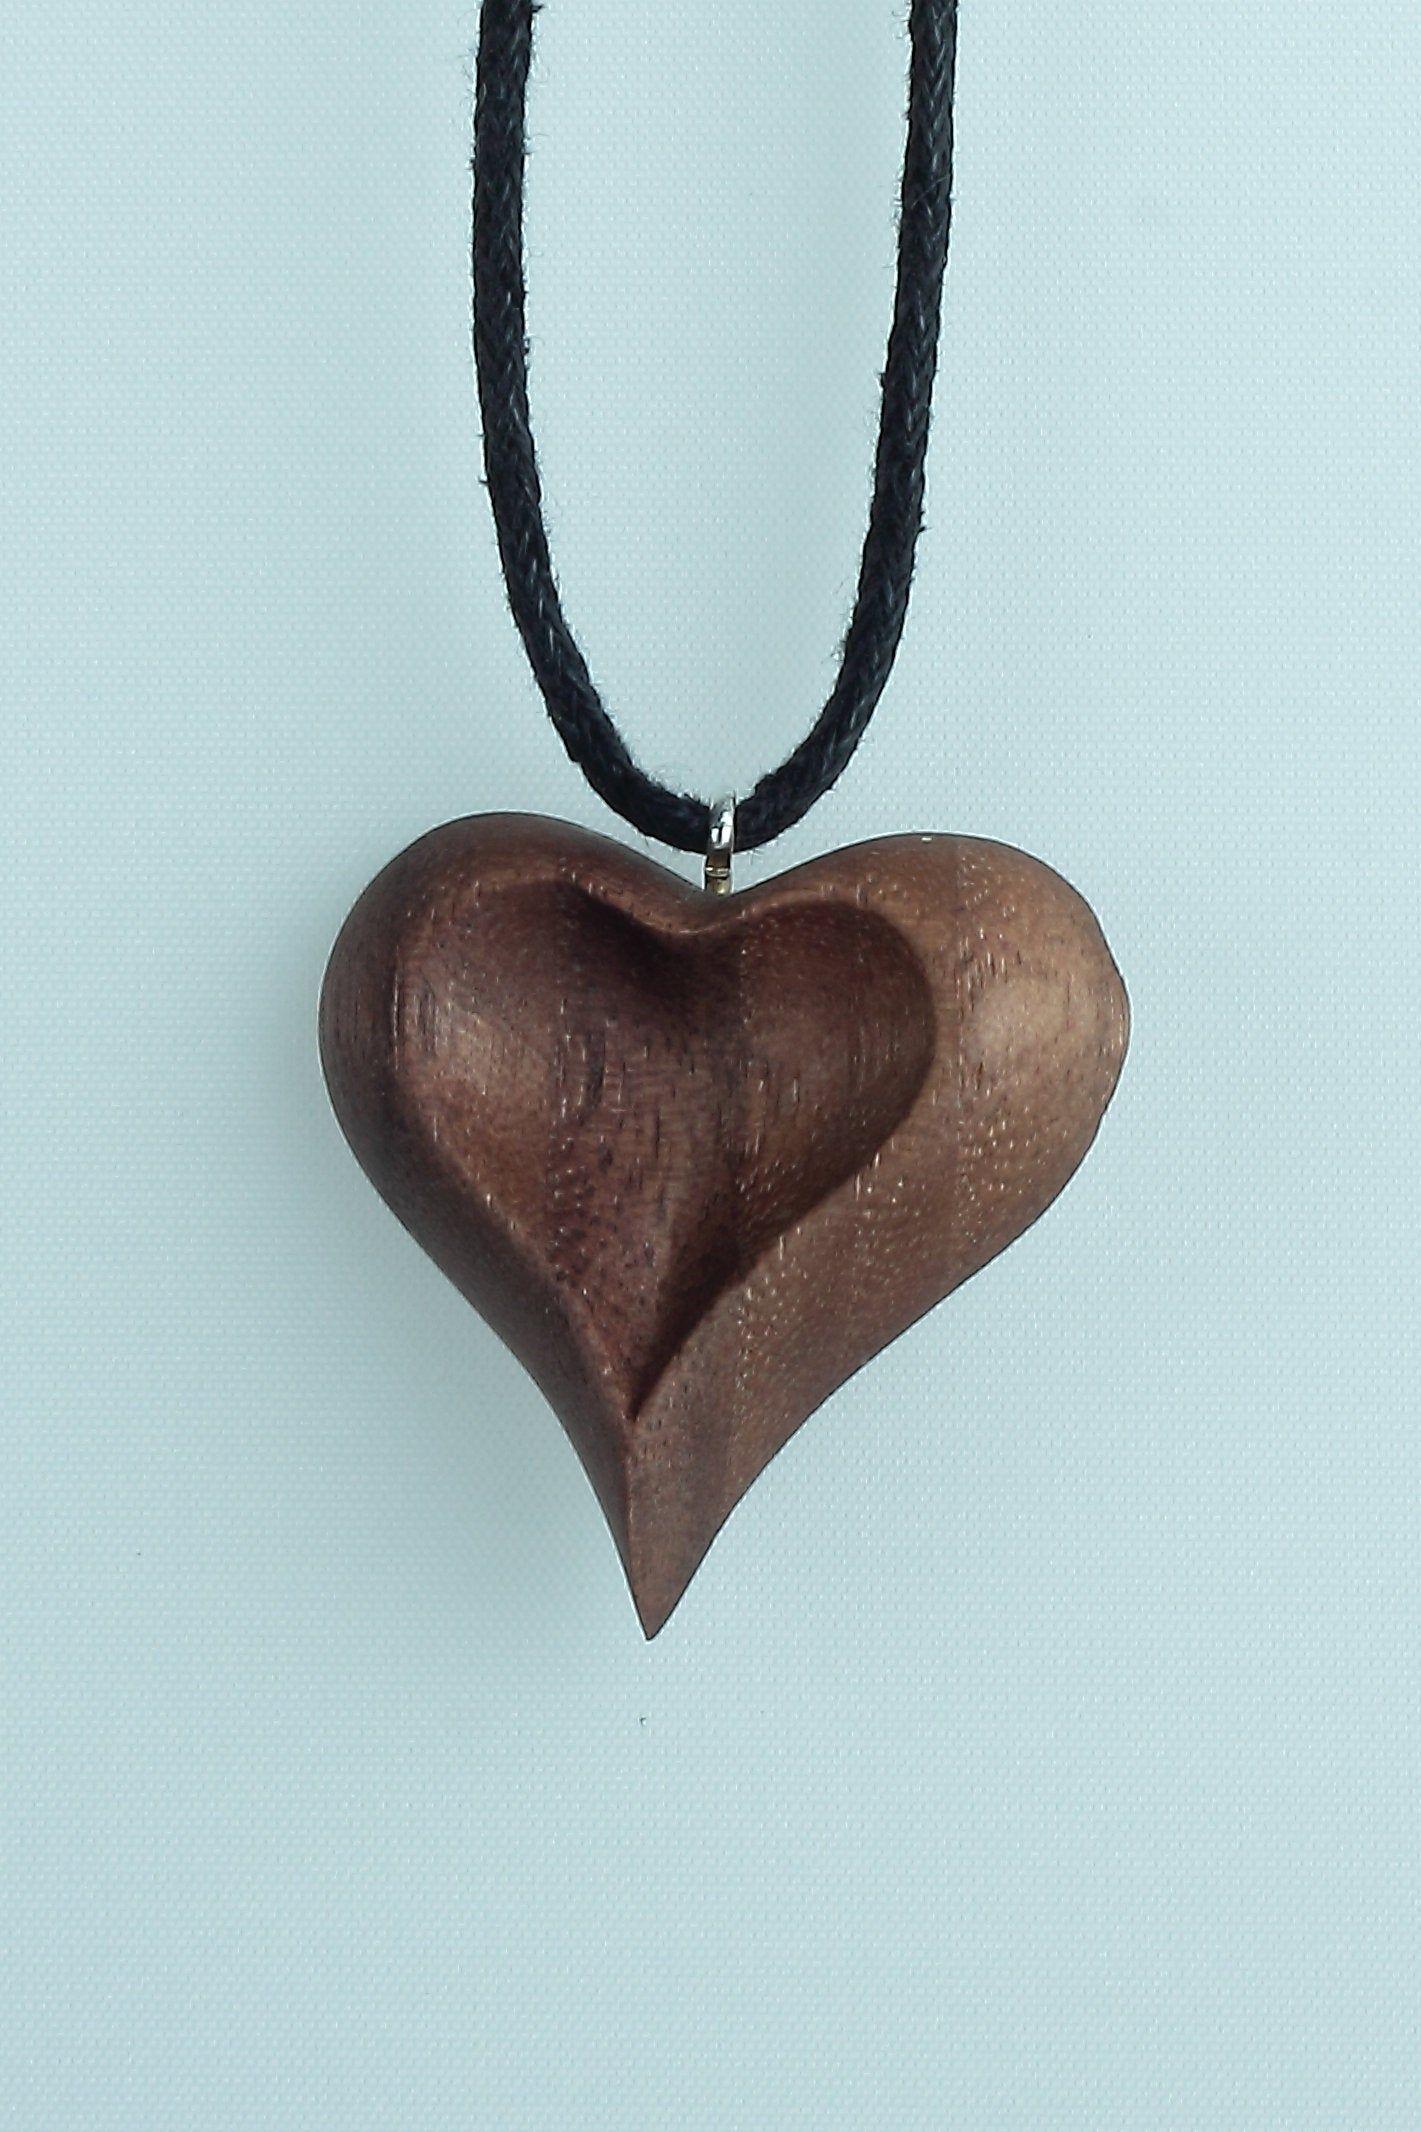 Wood Heart Pendant Wooden Heart Necklace Heart Necklace Hand Carved Pendant Wood Necklace Heart Jewelry Wooden Heart Pendant Wooden Jewelery Wood Necklace Pendant